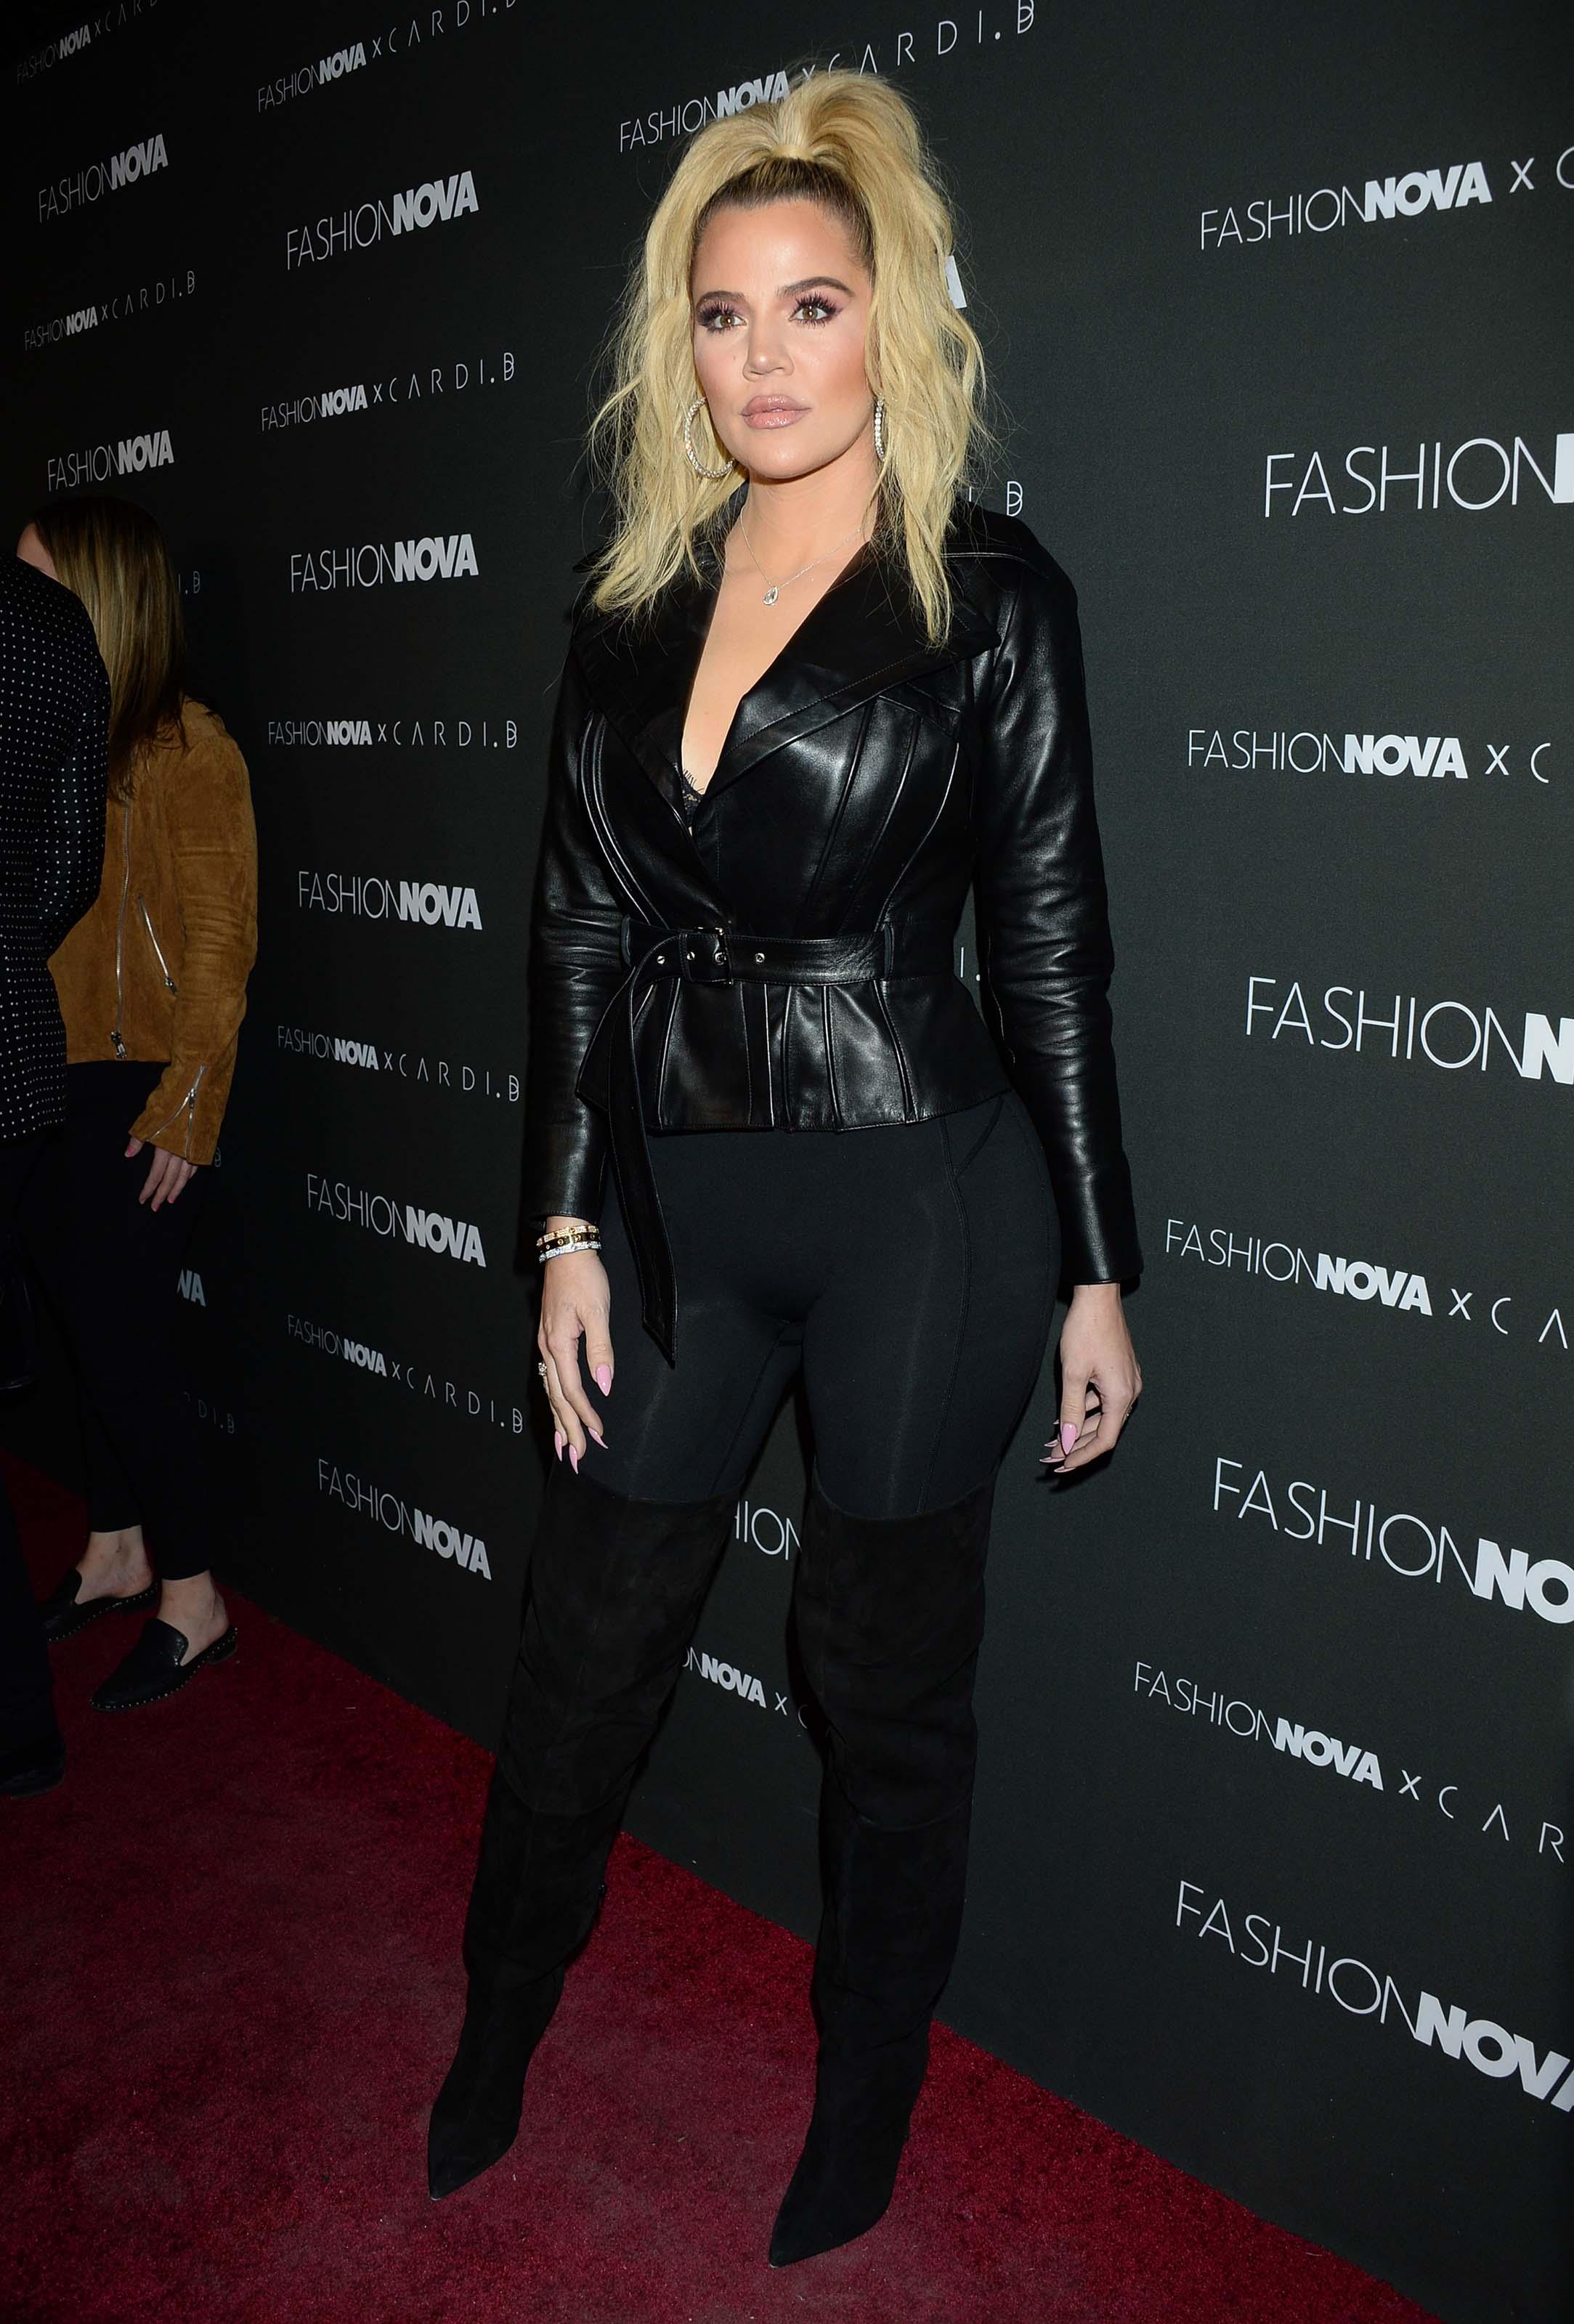 Khloe Kardashian & Hrush Achemyan attend Fashion Nova x Cardi B Launch Event